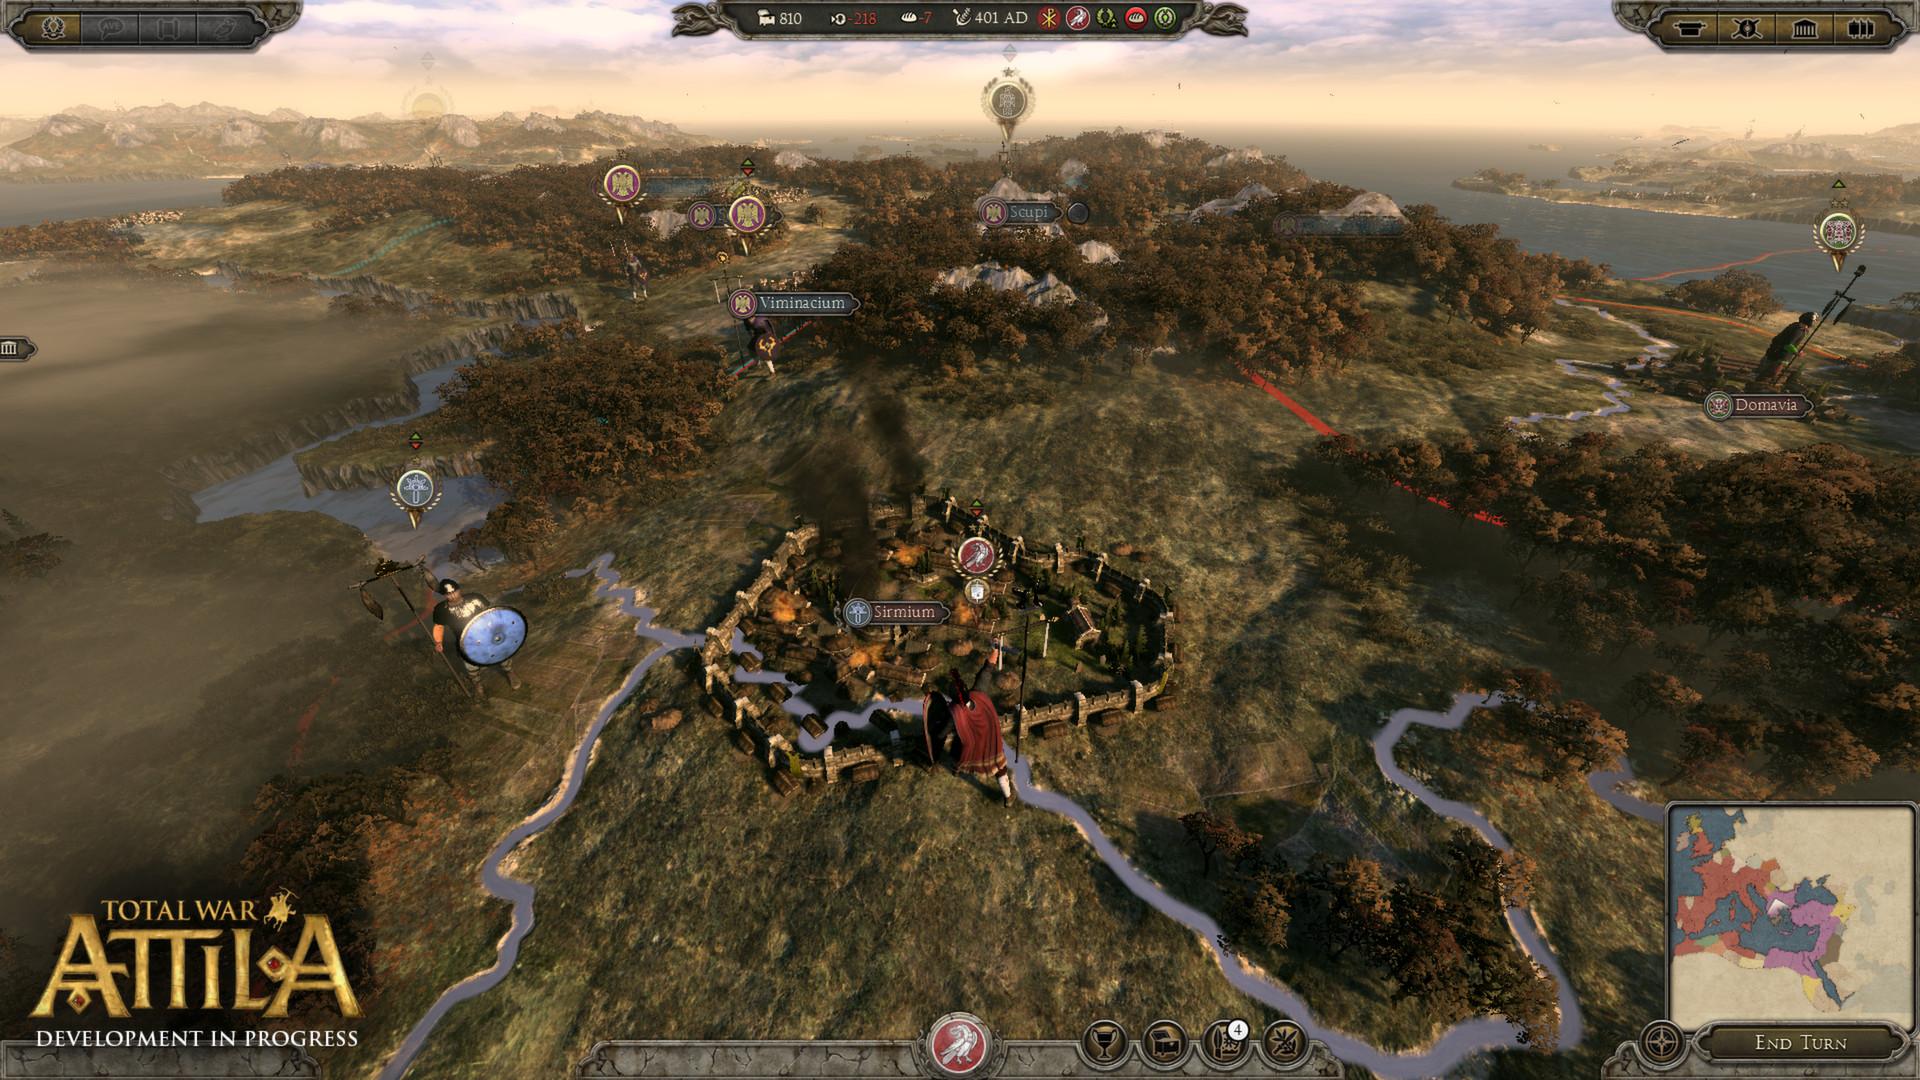 Total War Attila ESPAÑOL Full PC Incluye DLC (CPY) + REPACK 2 DVD5 (JPW) 10